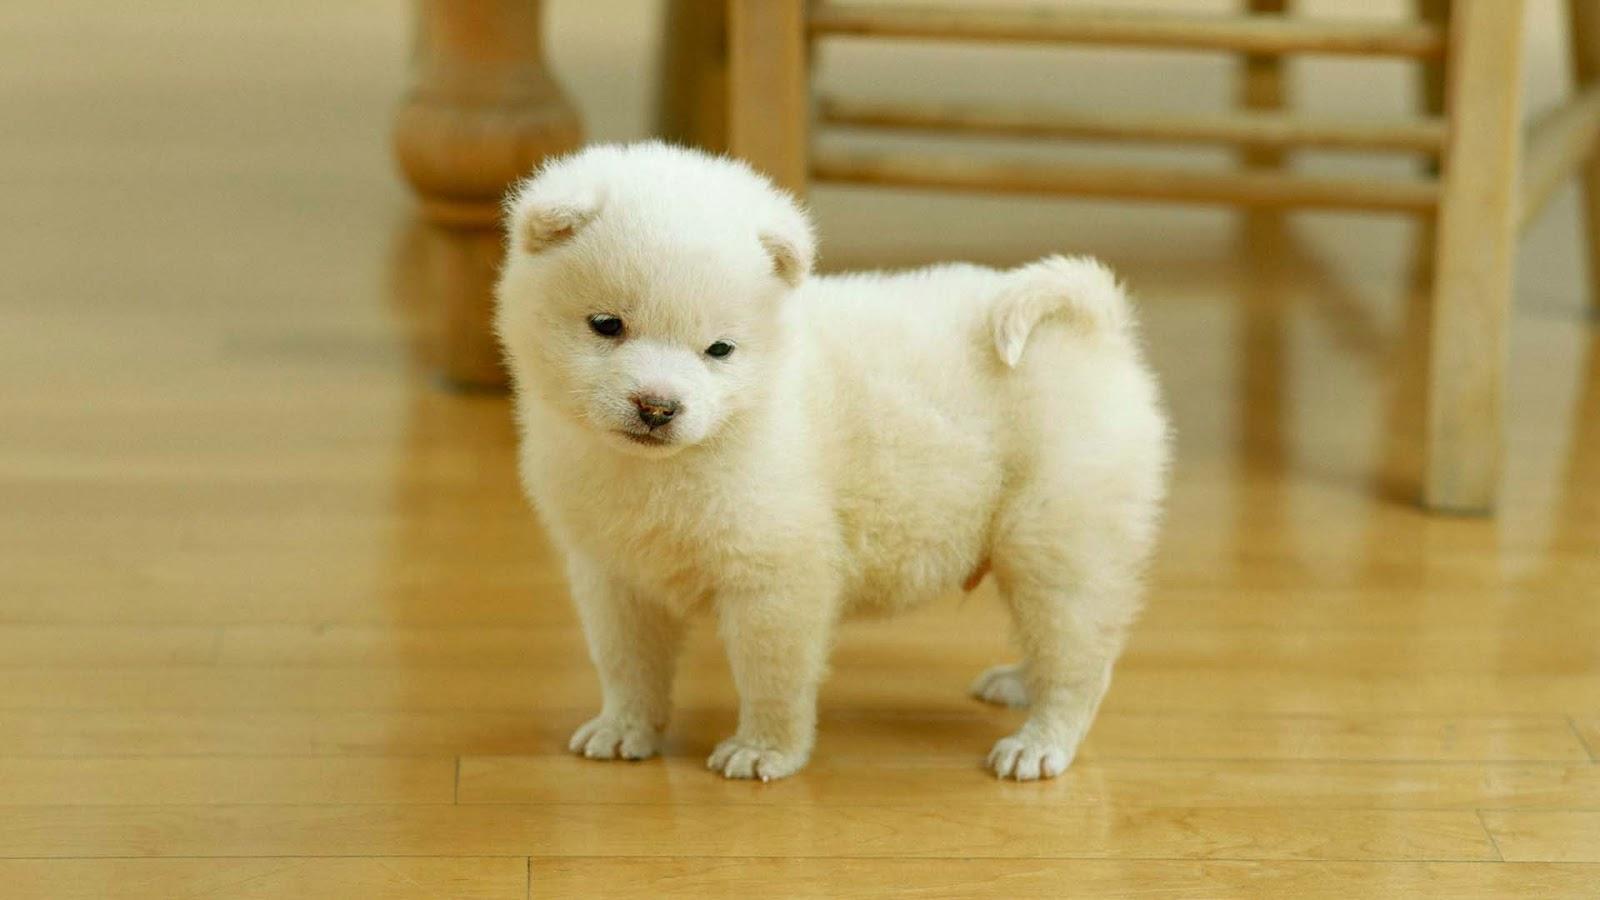 Cute Pomeranian Puppies Wallpaper image   Free HD Wallpaper